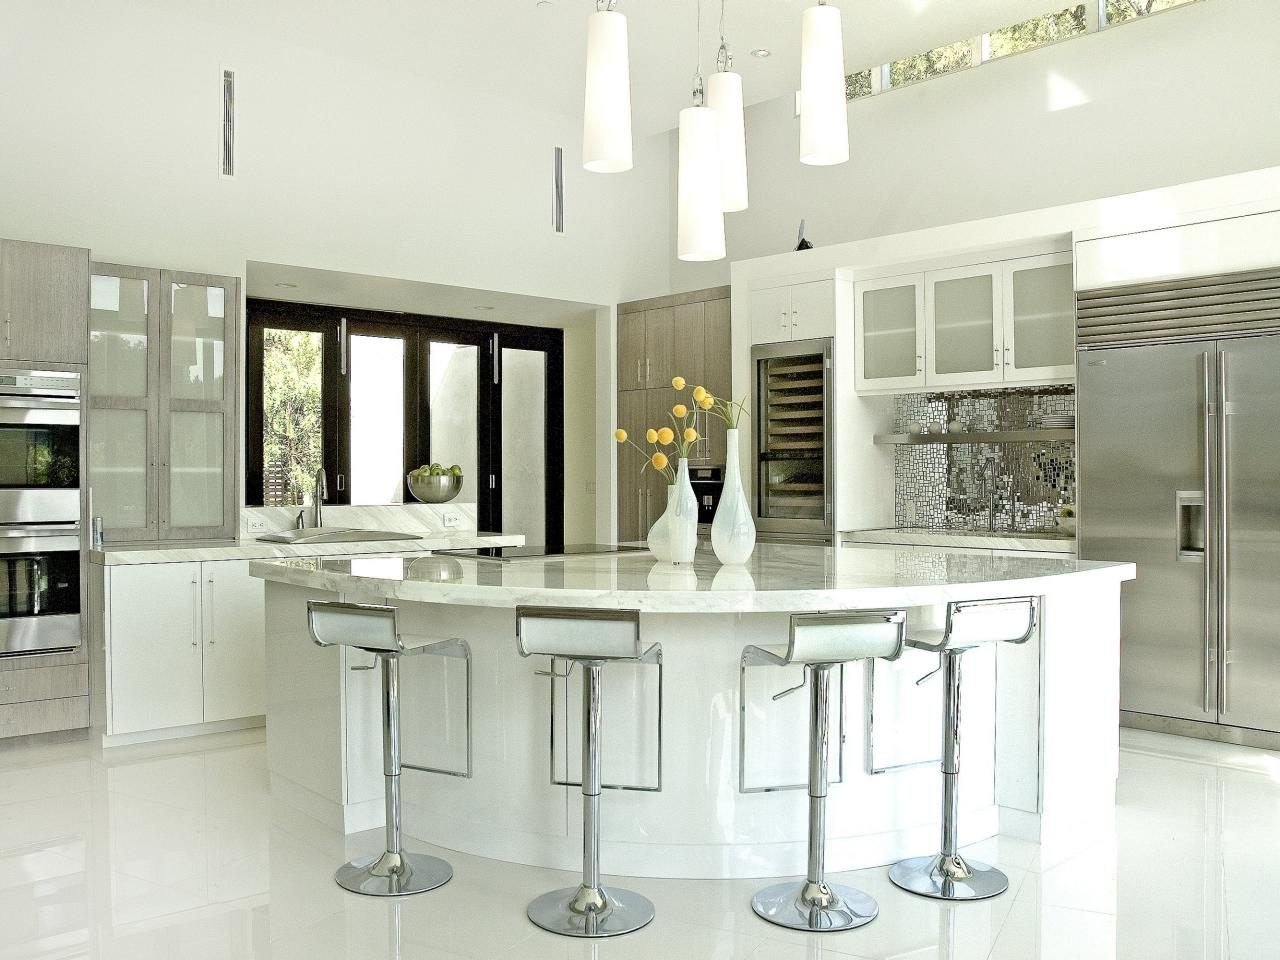 Kitchen Backsplash Ideas For White Cabinets Modern Minimalist White Kitchen Ideas White Gloss Kitc White Modern Kitchen Kitchen Design Color Kitchen Sink Decor